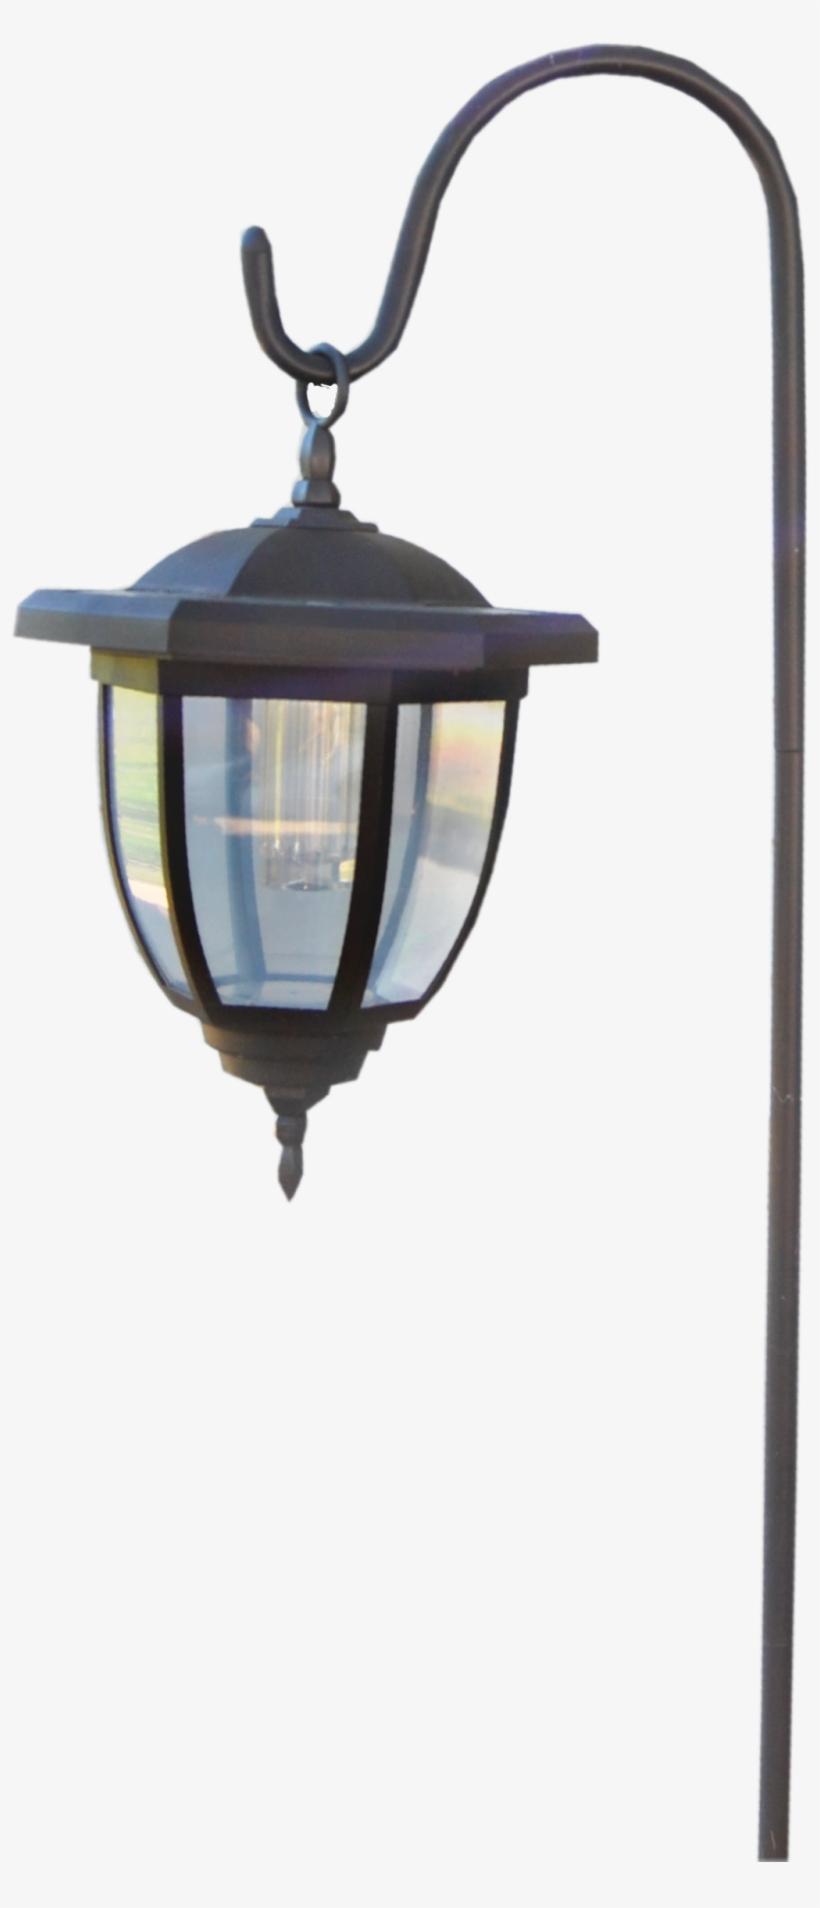 #lantern #light #lighting #ironrod #pole #styling #accessory - Street Light, transparent png #9579396